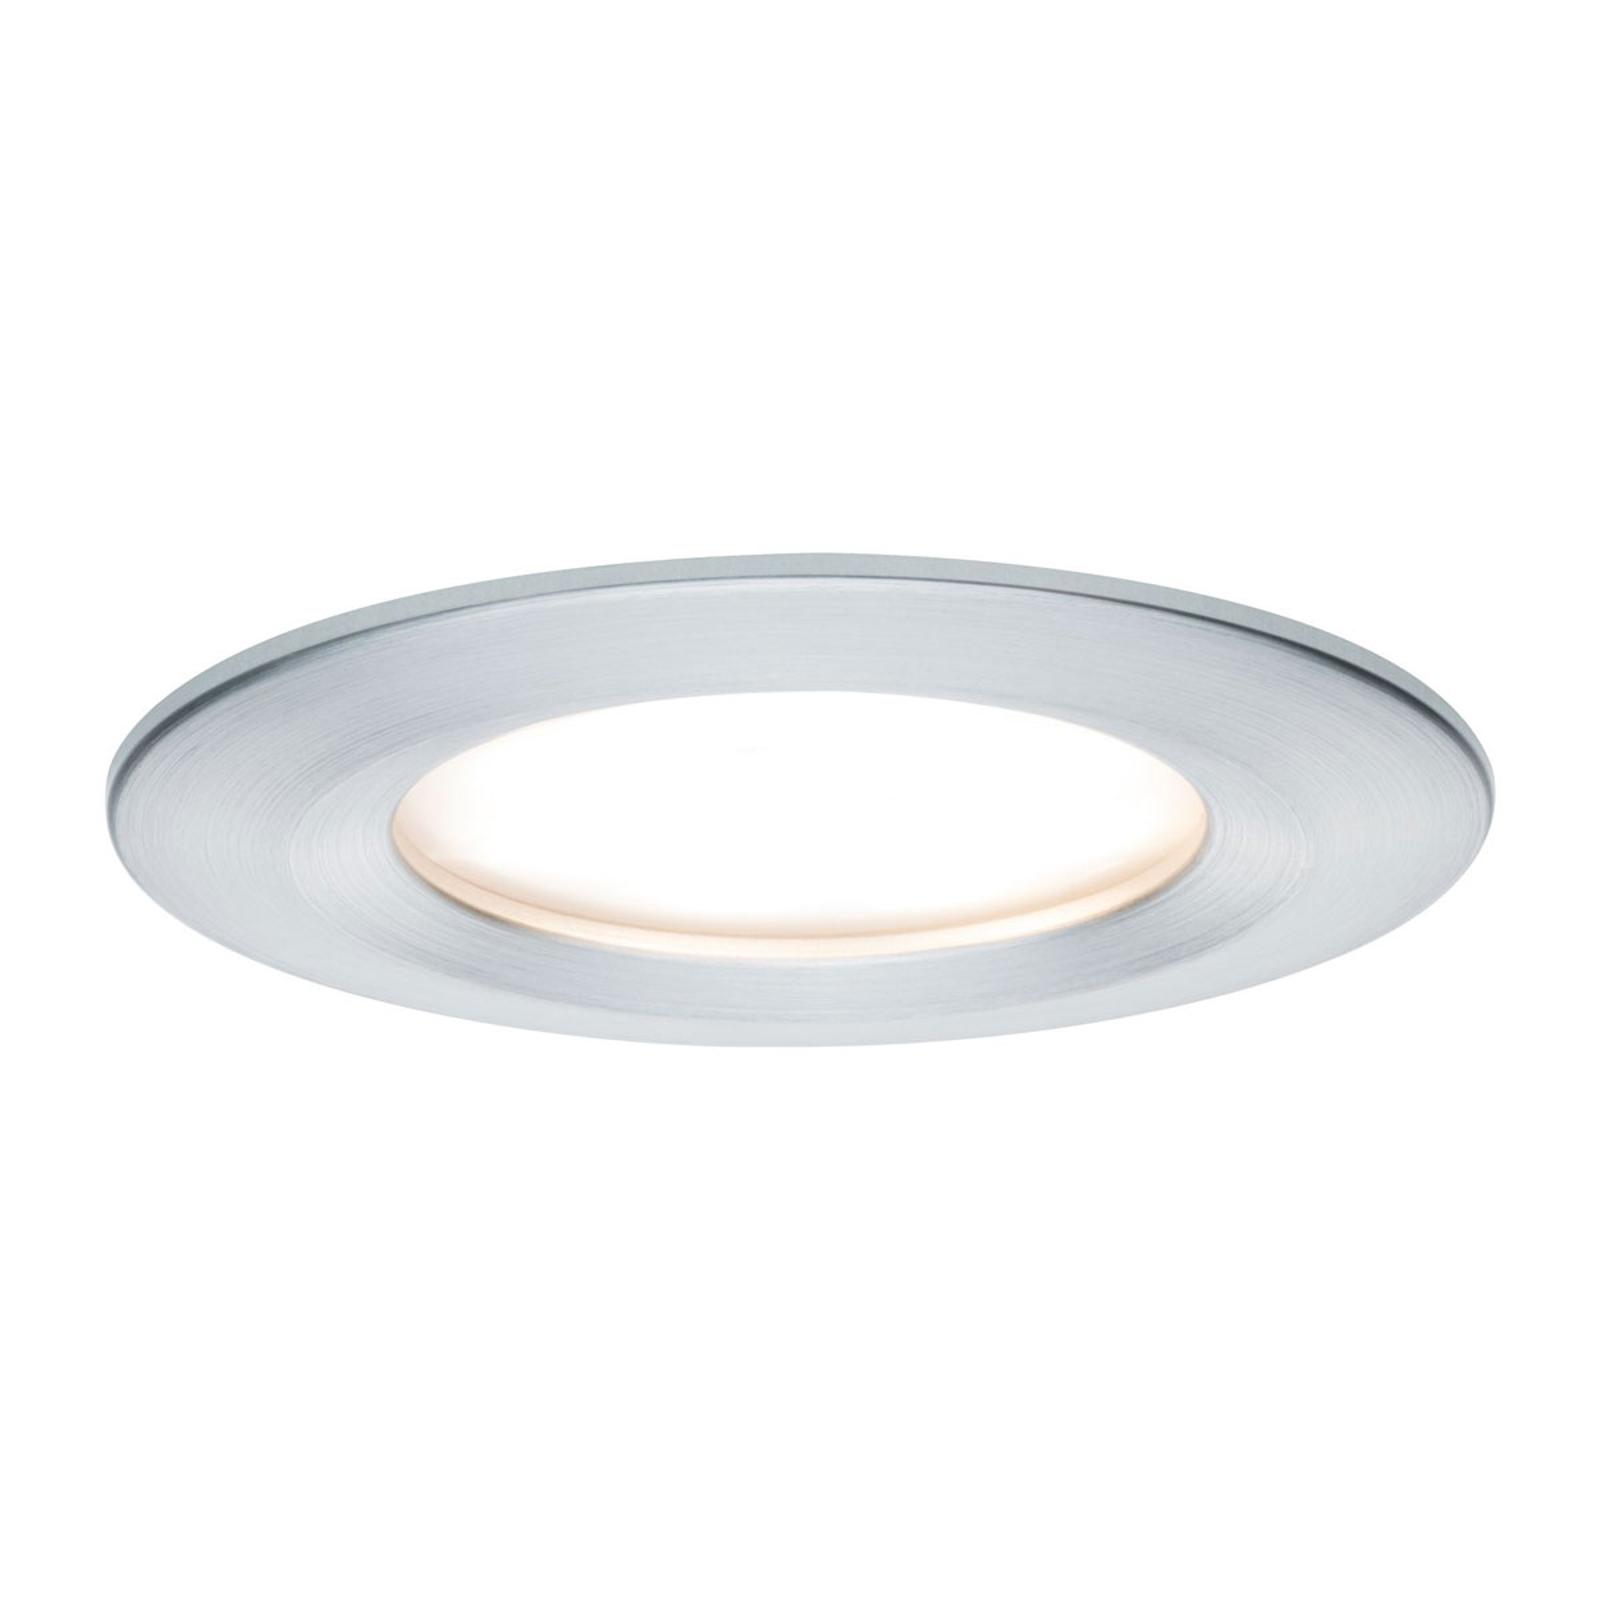 Paulmann LED-spot Nova Coin rund, dimbar aluminium